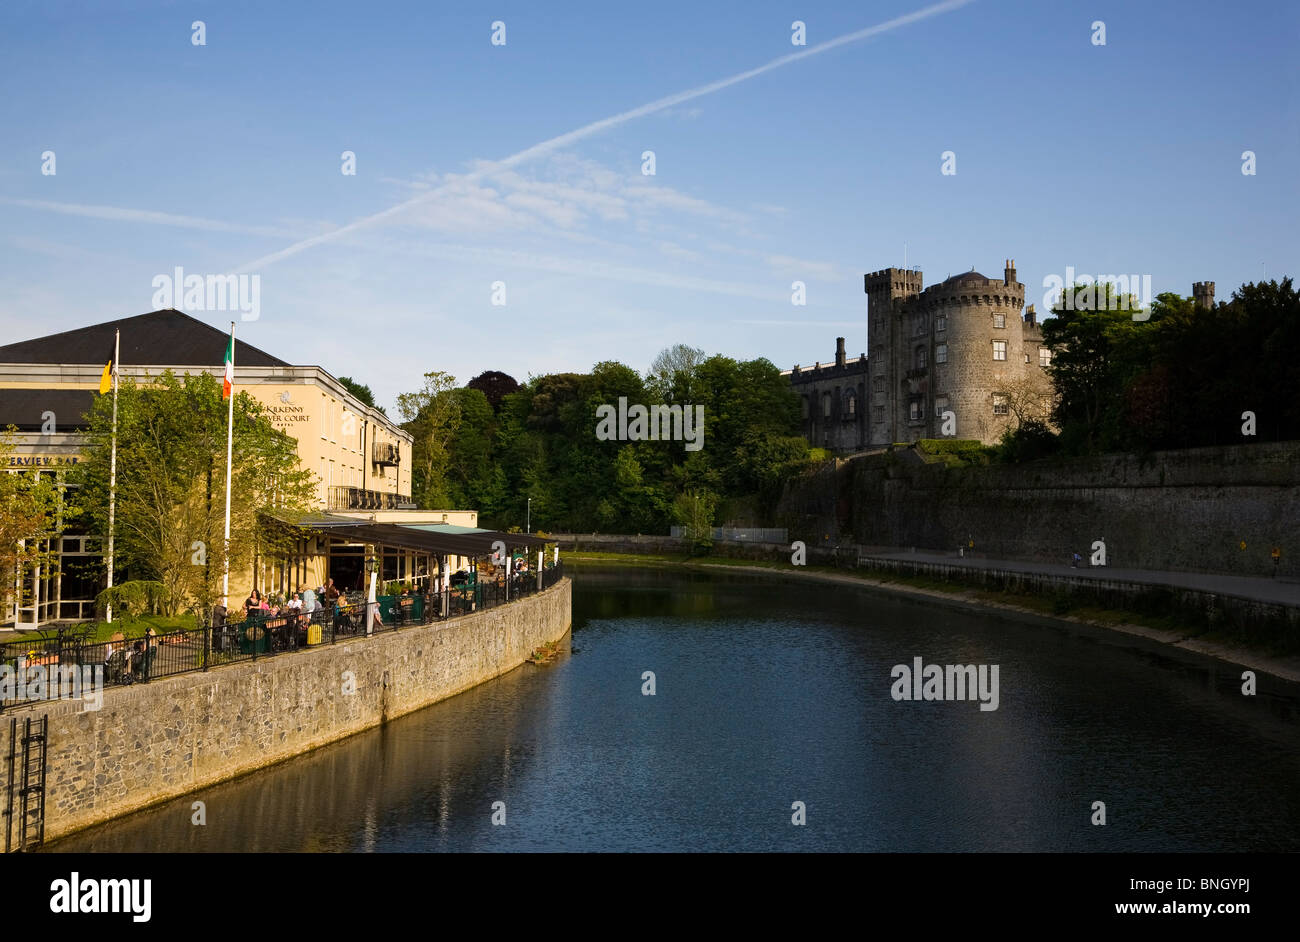 Kilkenny Castle and Riverside Bar, River Nore, Kilkenny City, Ireland - Stock Image